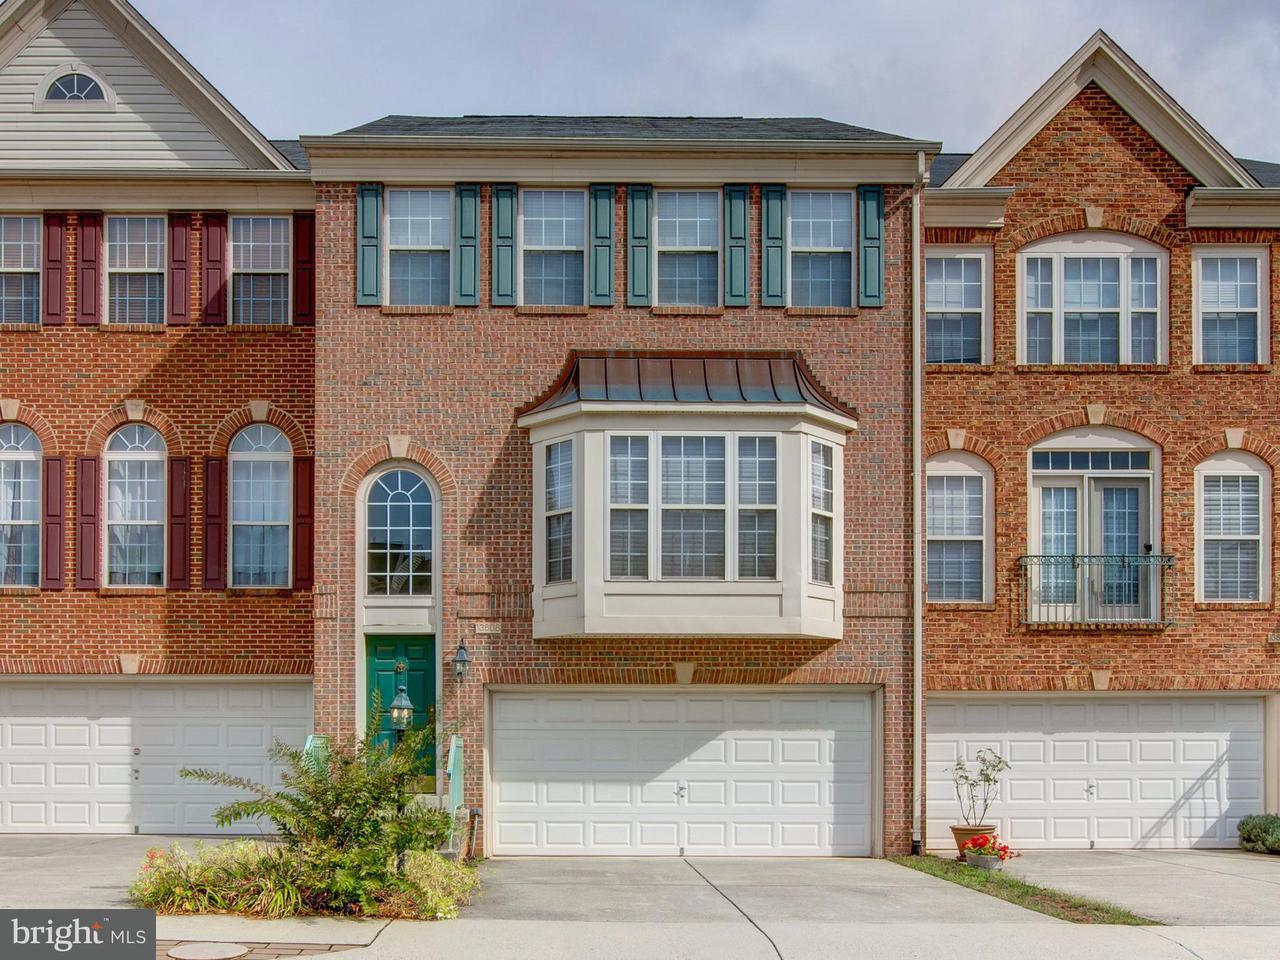 Townhouse for Sale at 13608 CEDAR RUN Lane 13608 CEDAR RUN Lane Herndon, Virginia 20171 United States